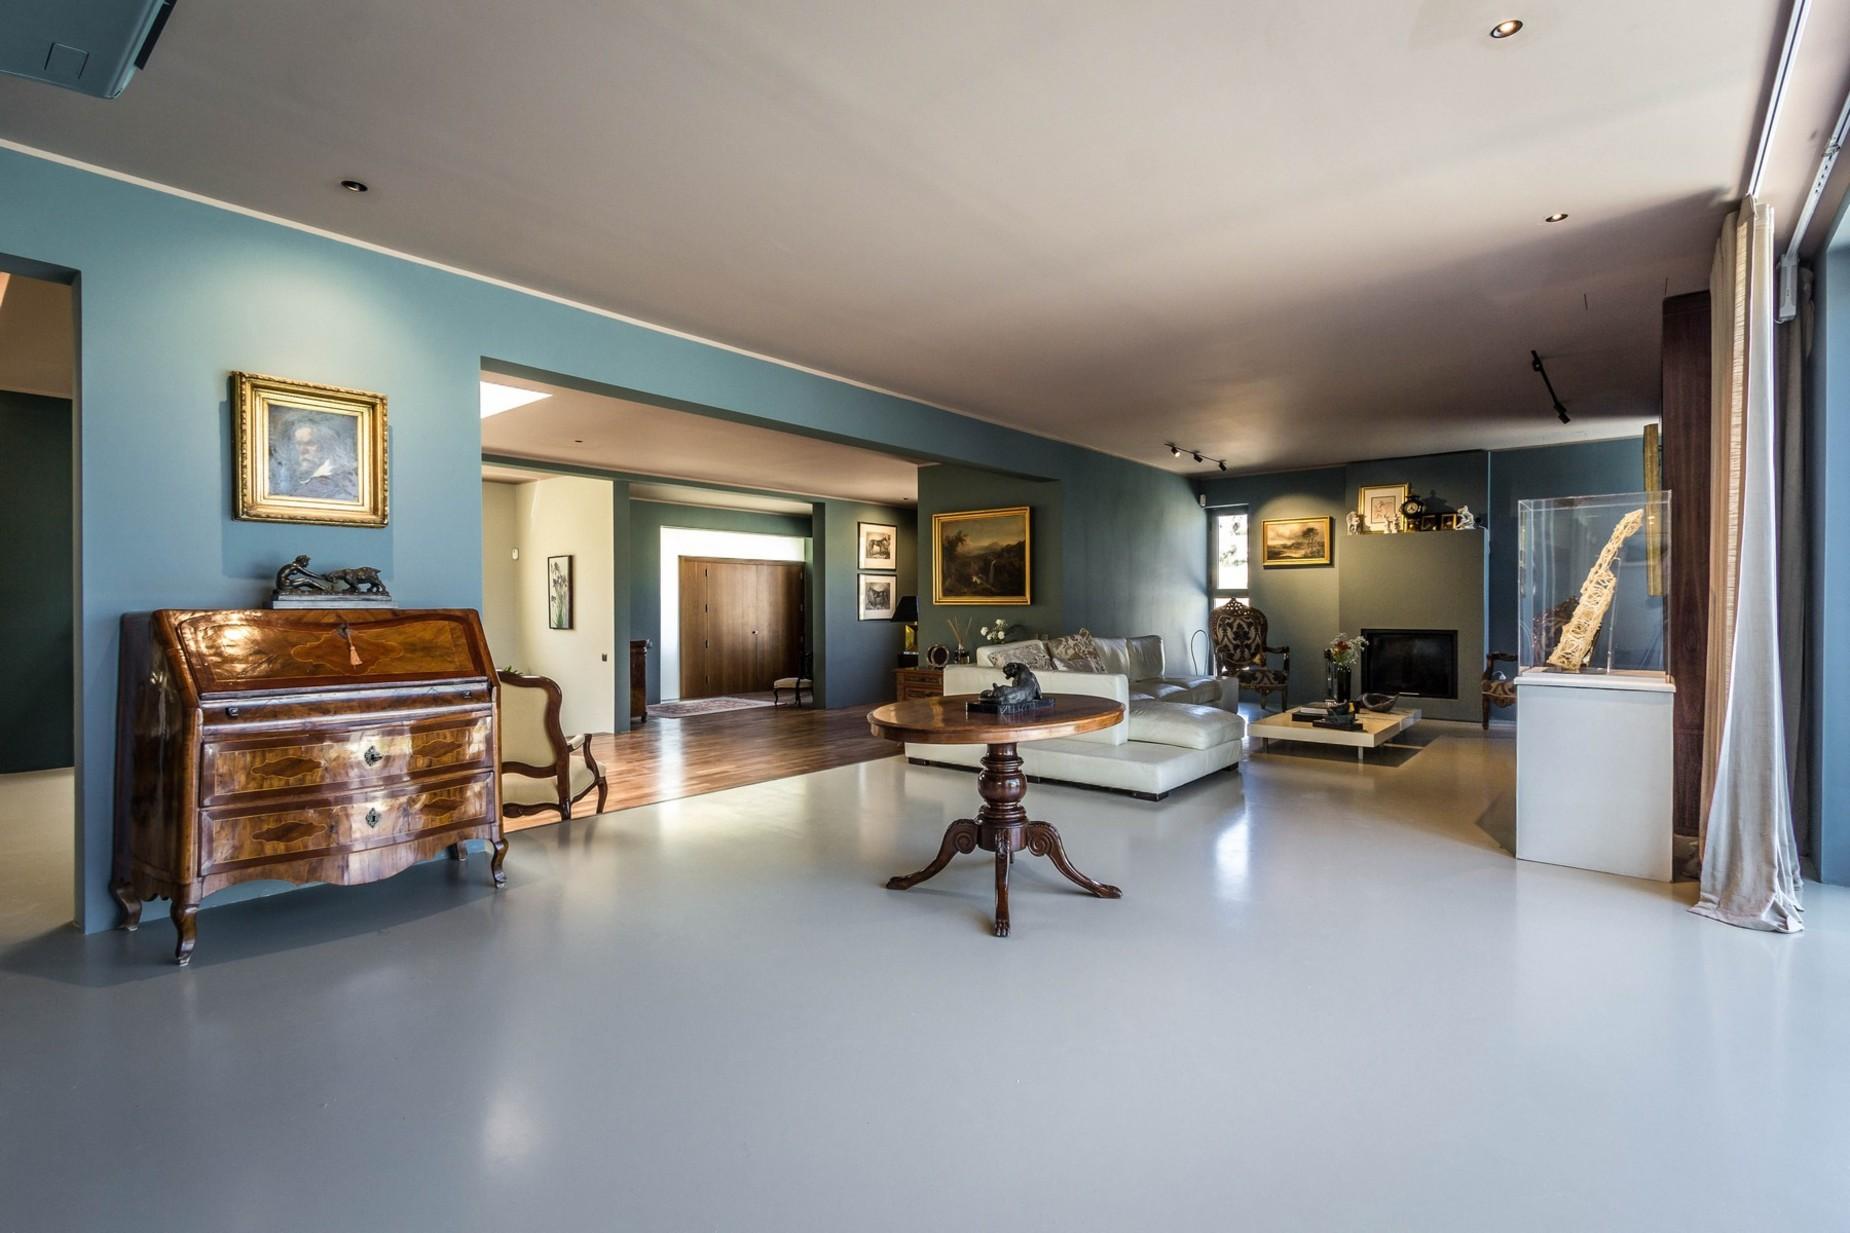 4 bed Villa For Rent in Iklin, Iklin - thumb 5